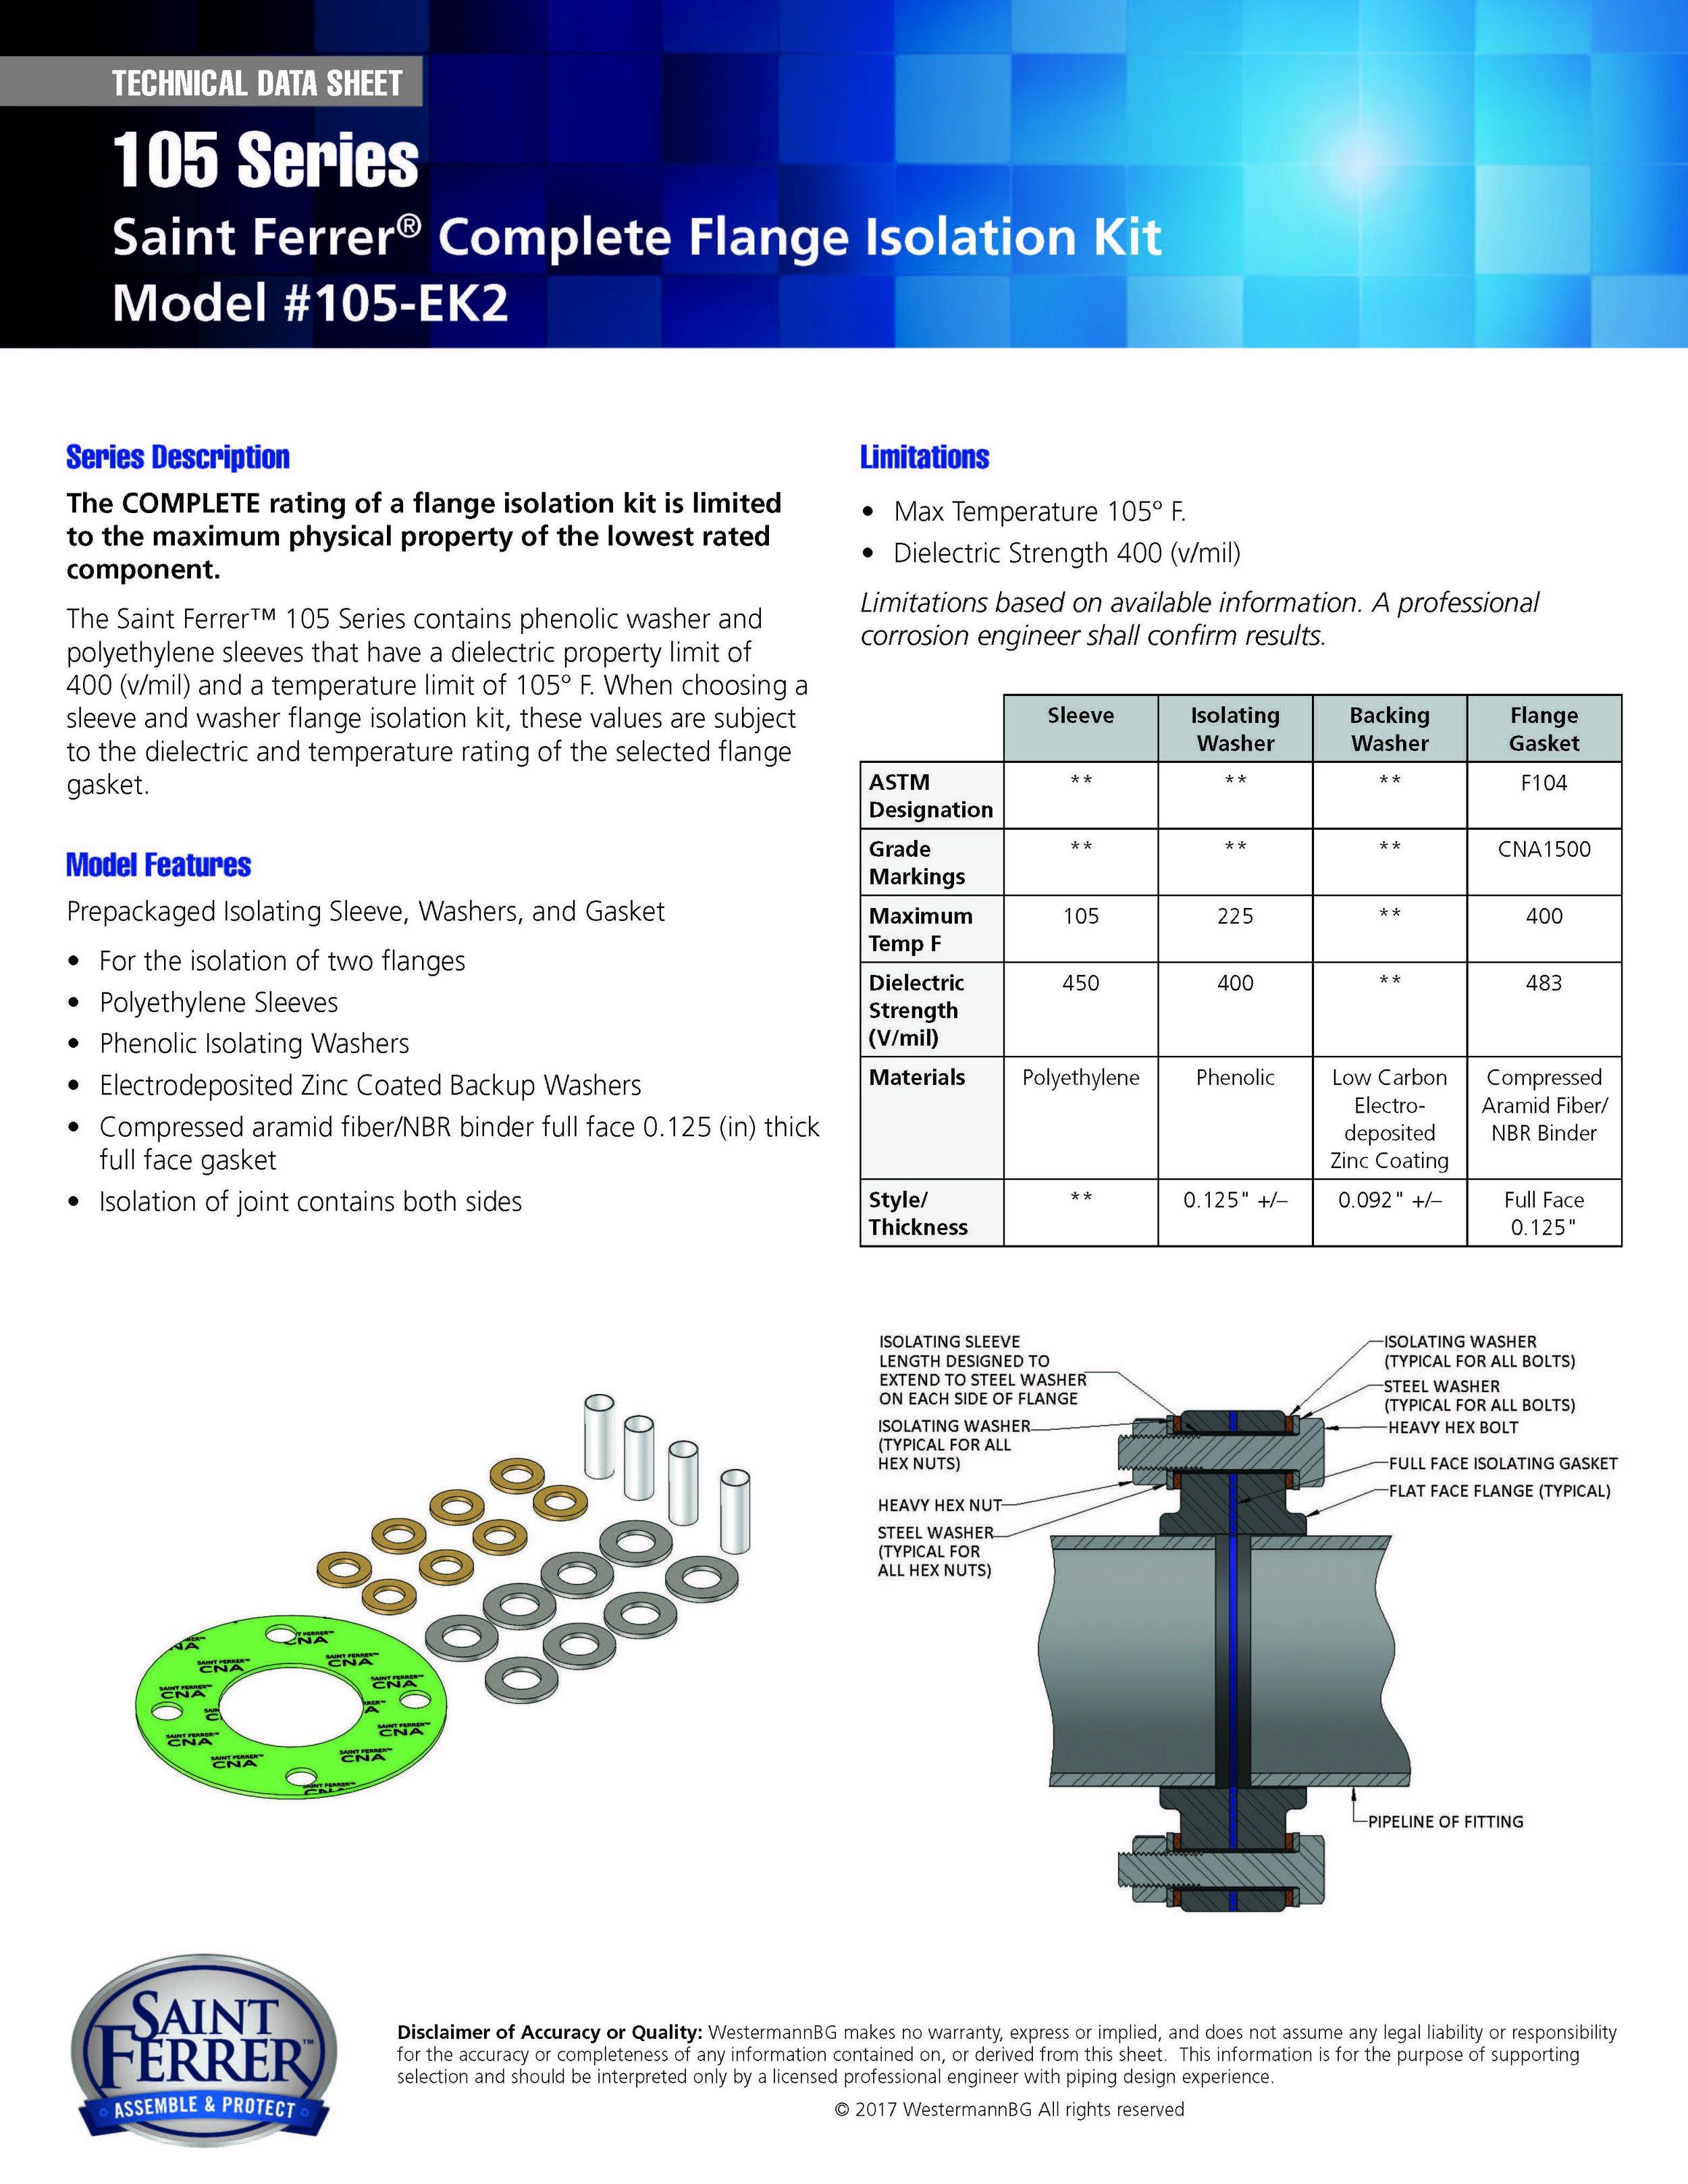 SF_Data_Sheet_105_Series_105-EK2.jpg